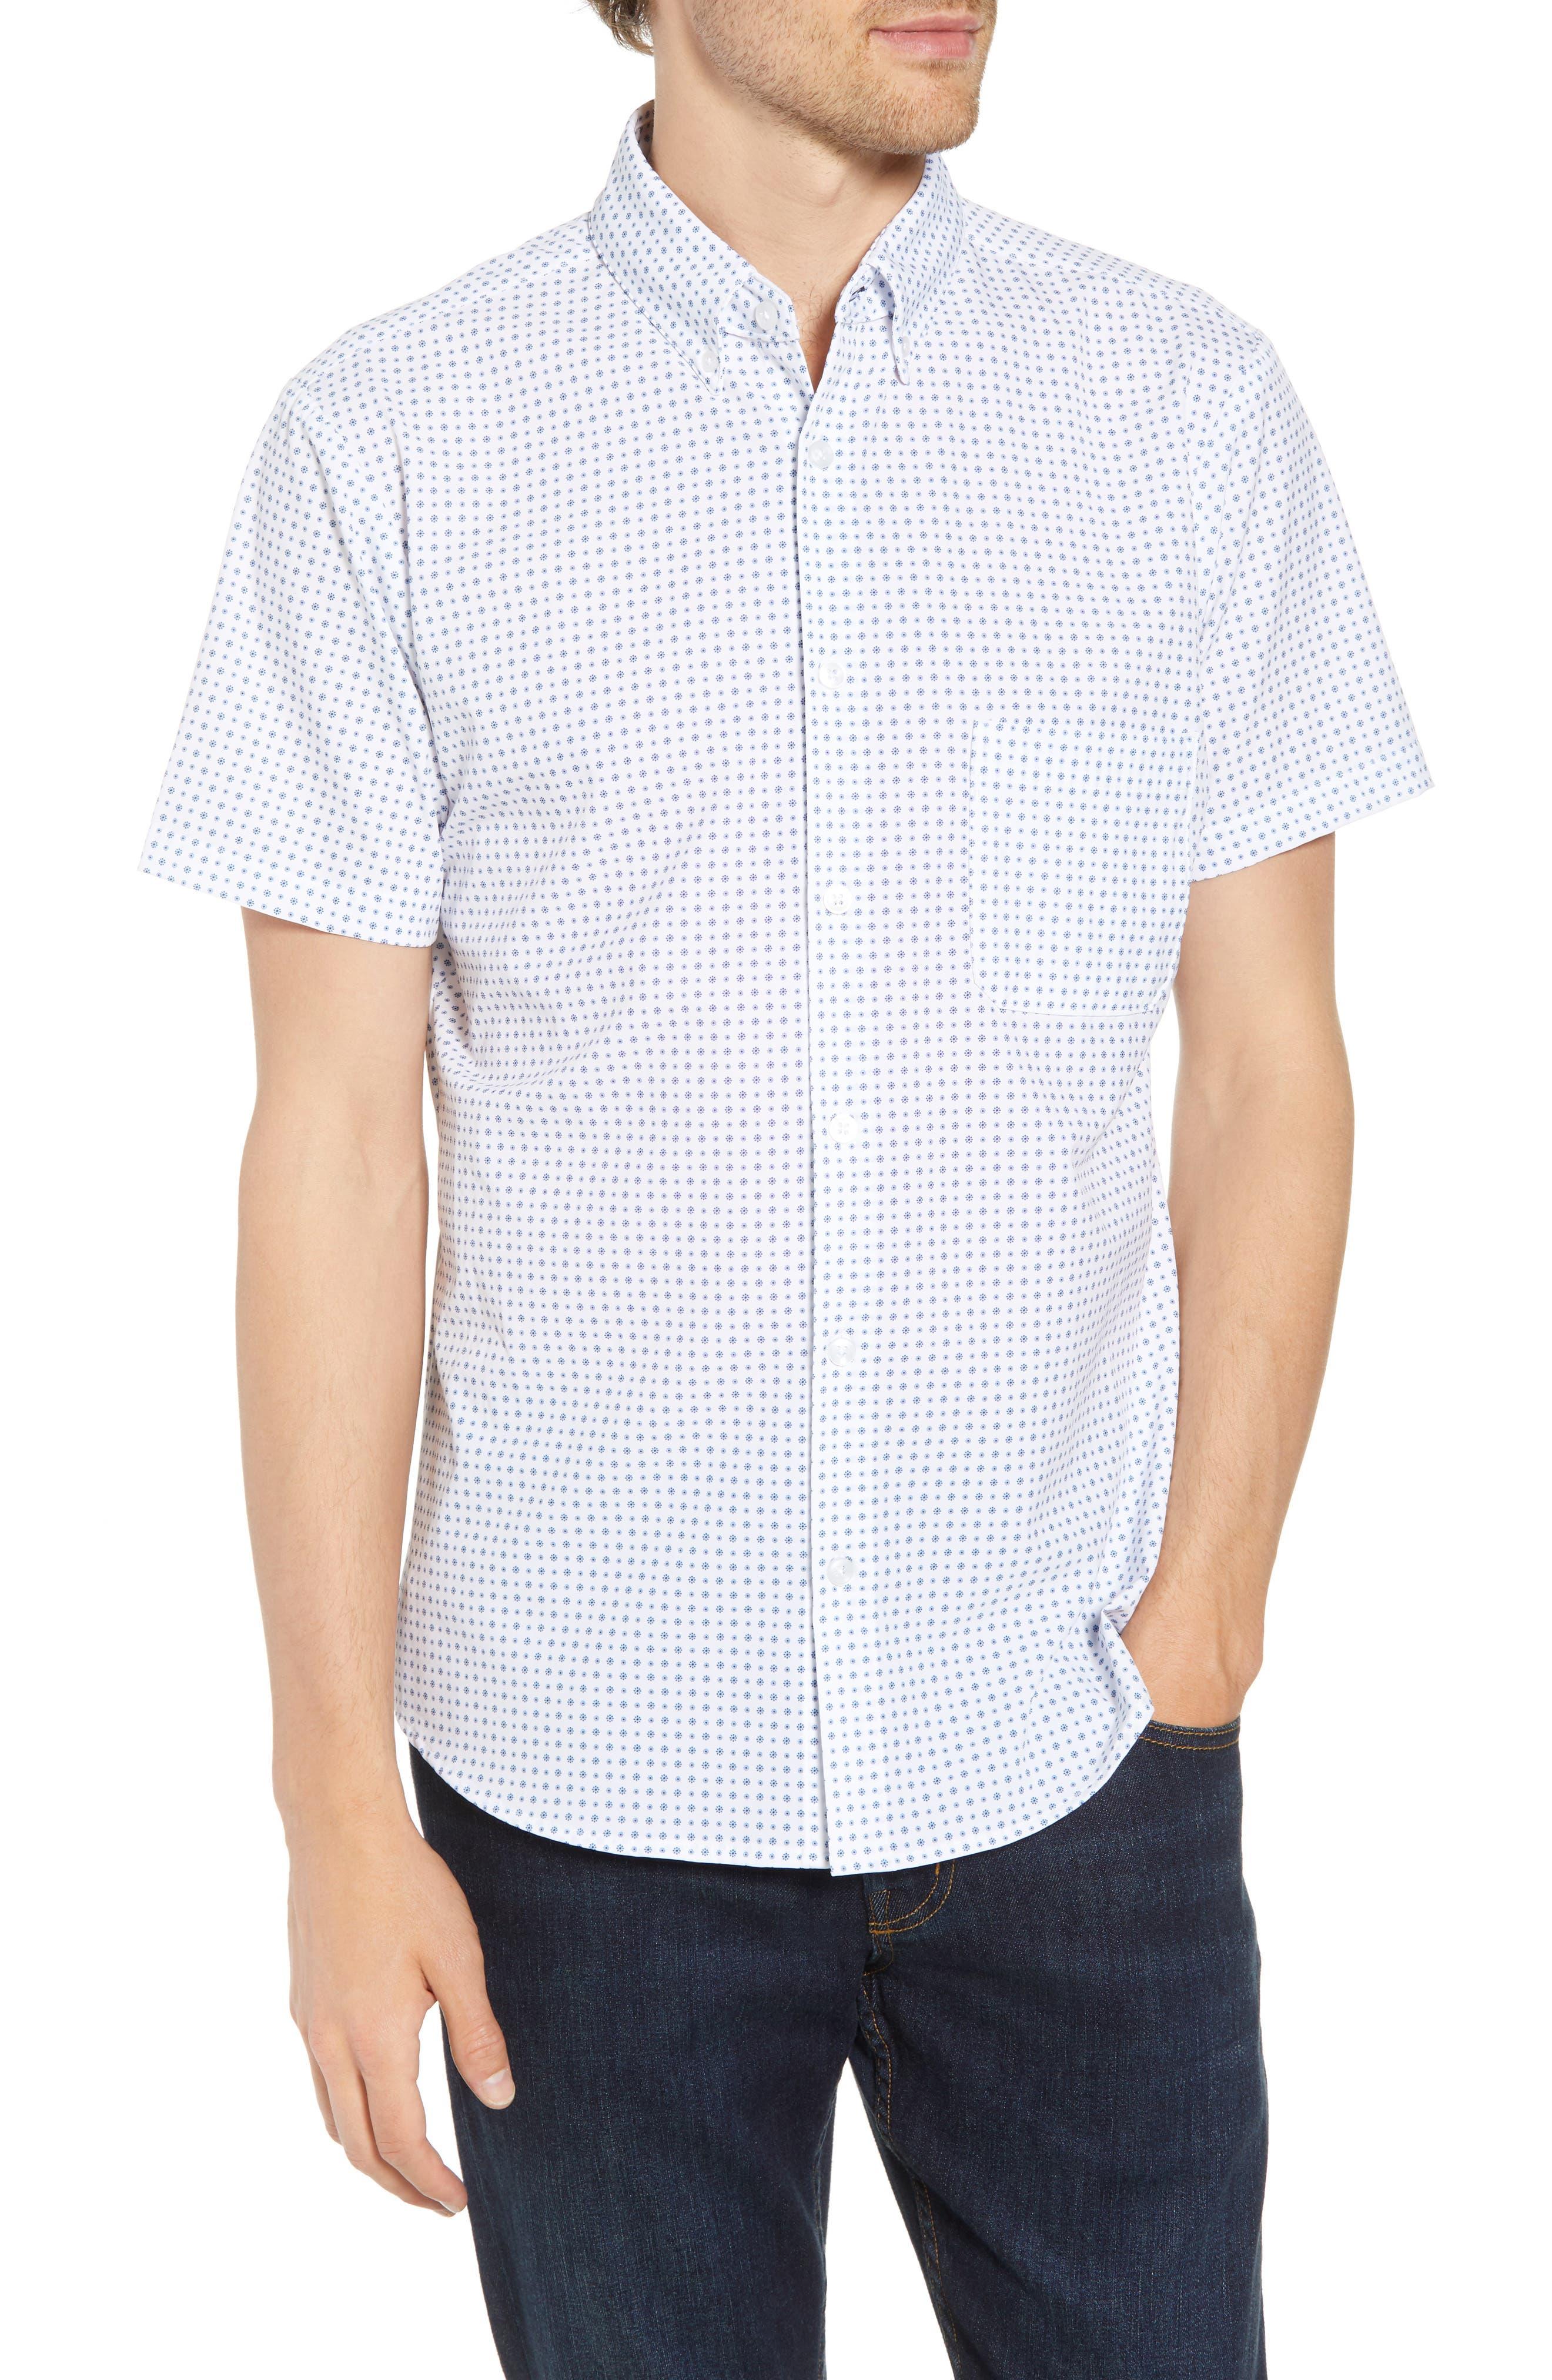 Darst Slim Fit Performance Sport Shirt,                             Main thumbnail 1, color,                             White